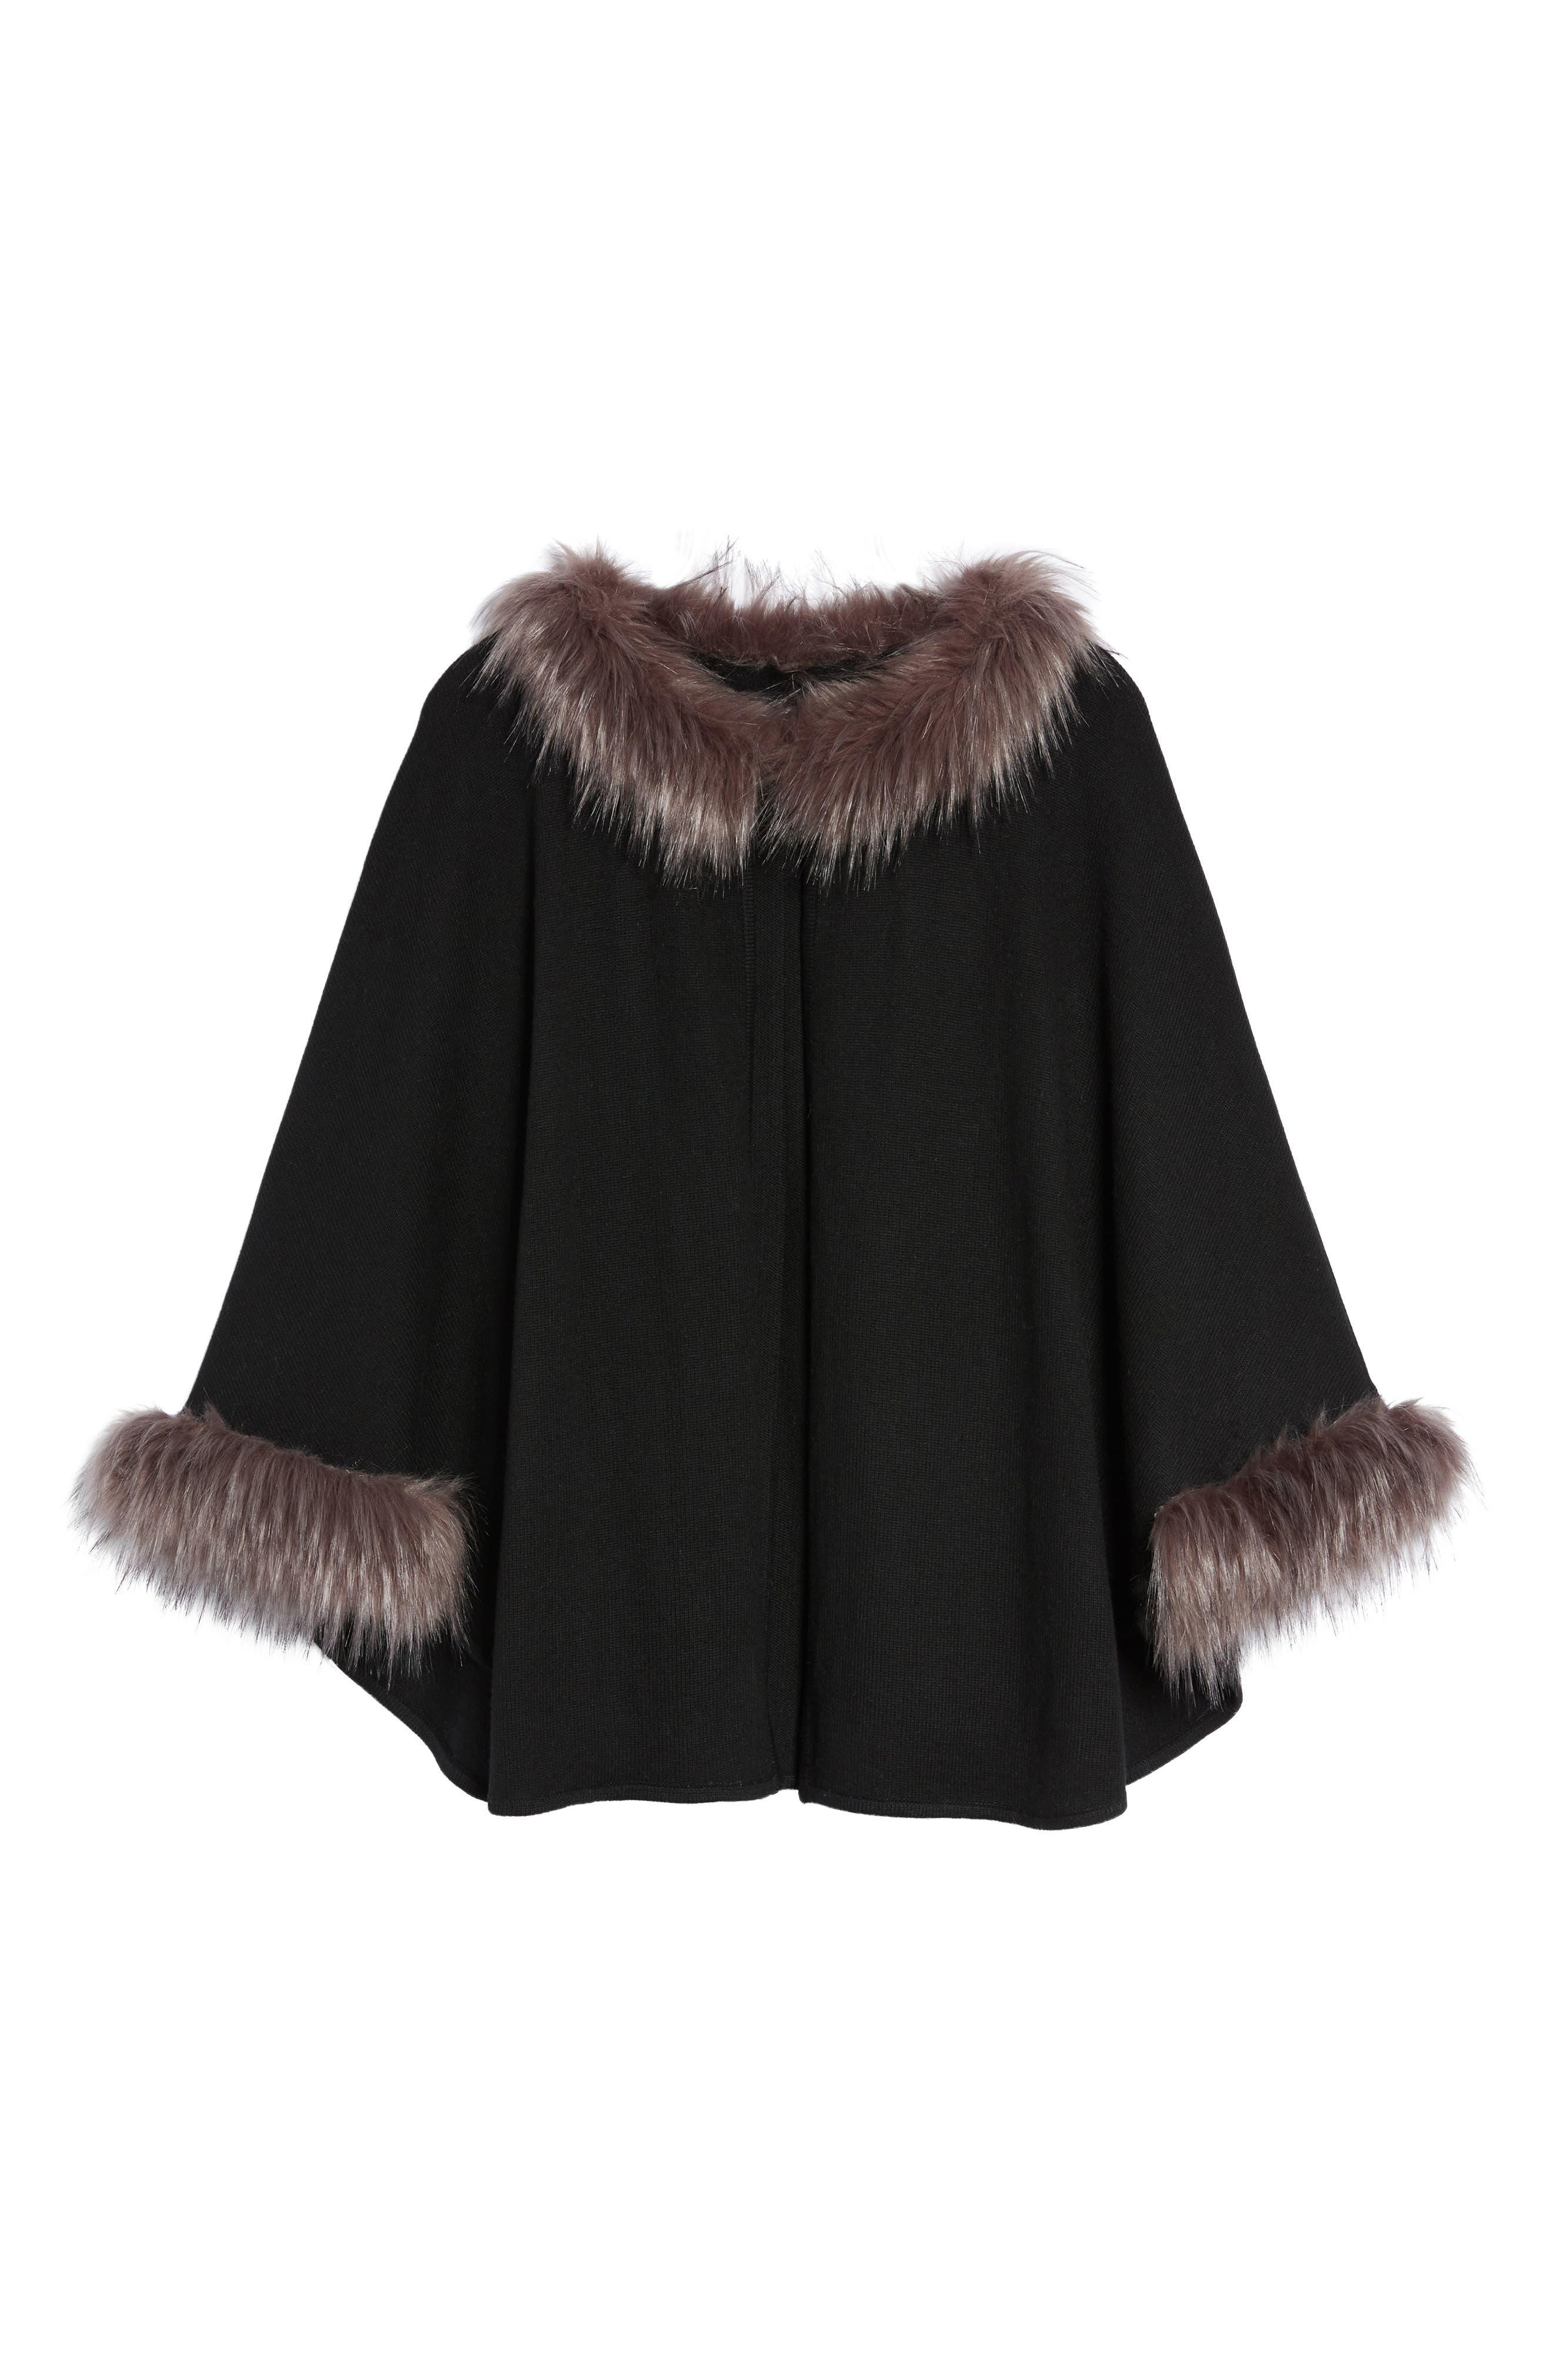 Knit Poncho with Faux Fur Trim,                             Alternate thumbnail 5, color,                             001